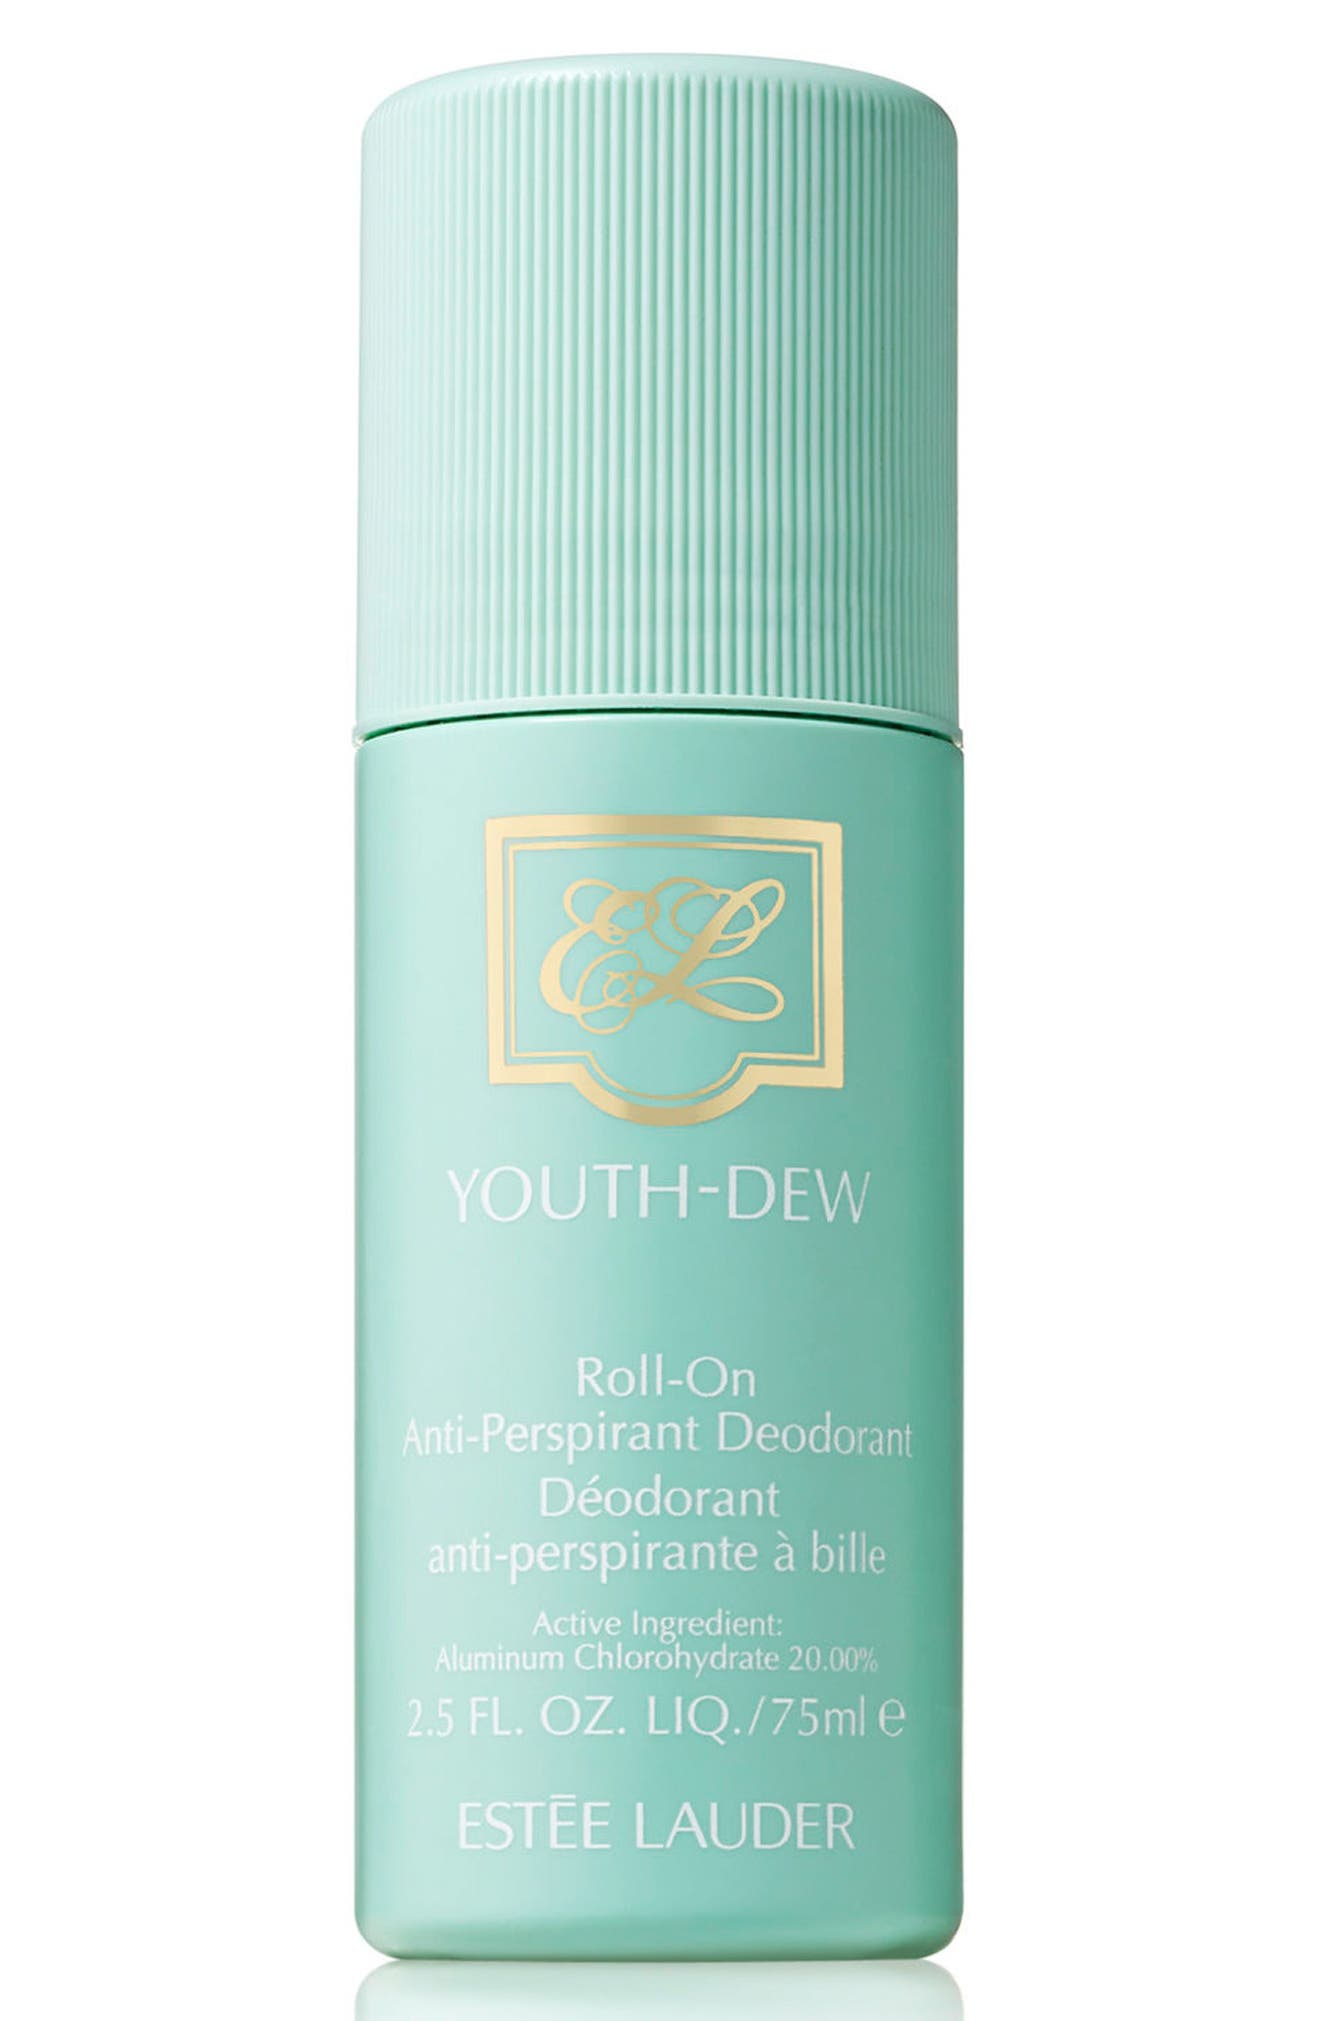 Youth Antiperspirantdeodorant Dew Dew On Roll Youth RjAq453LSc